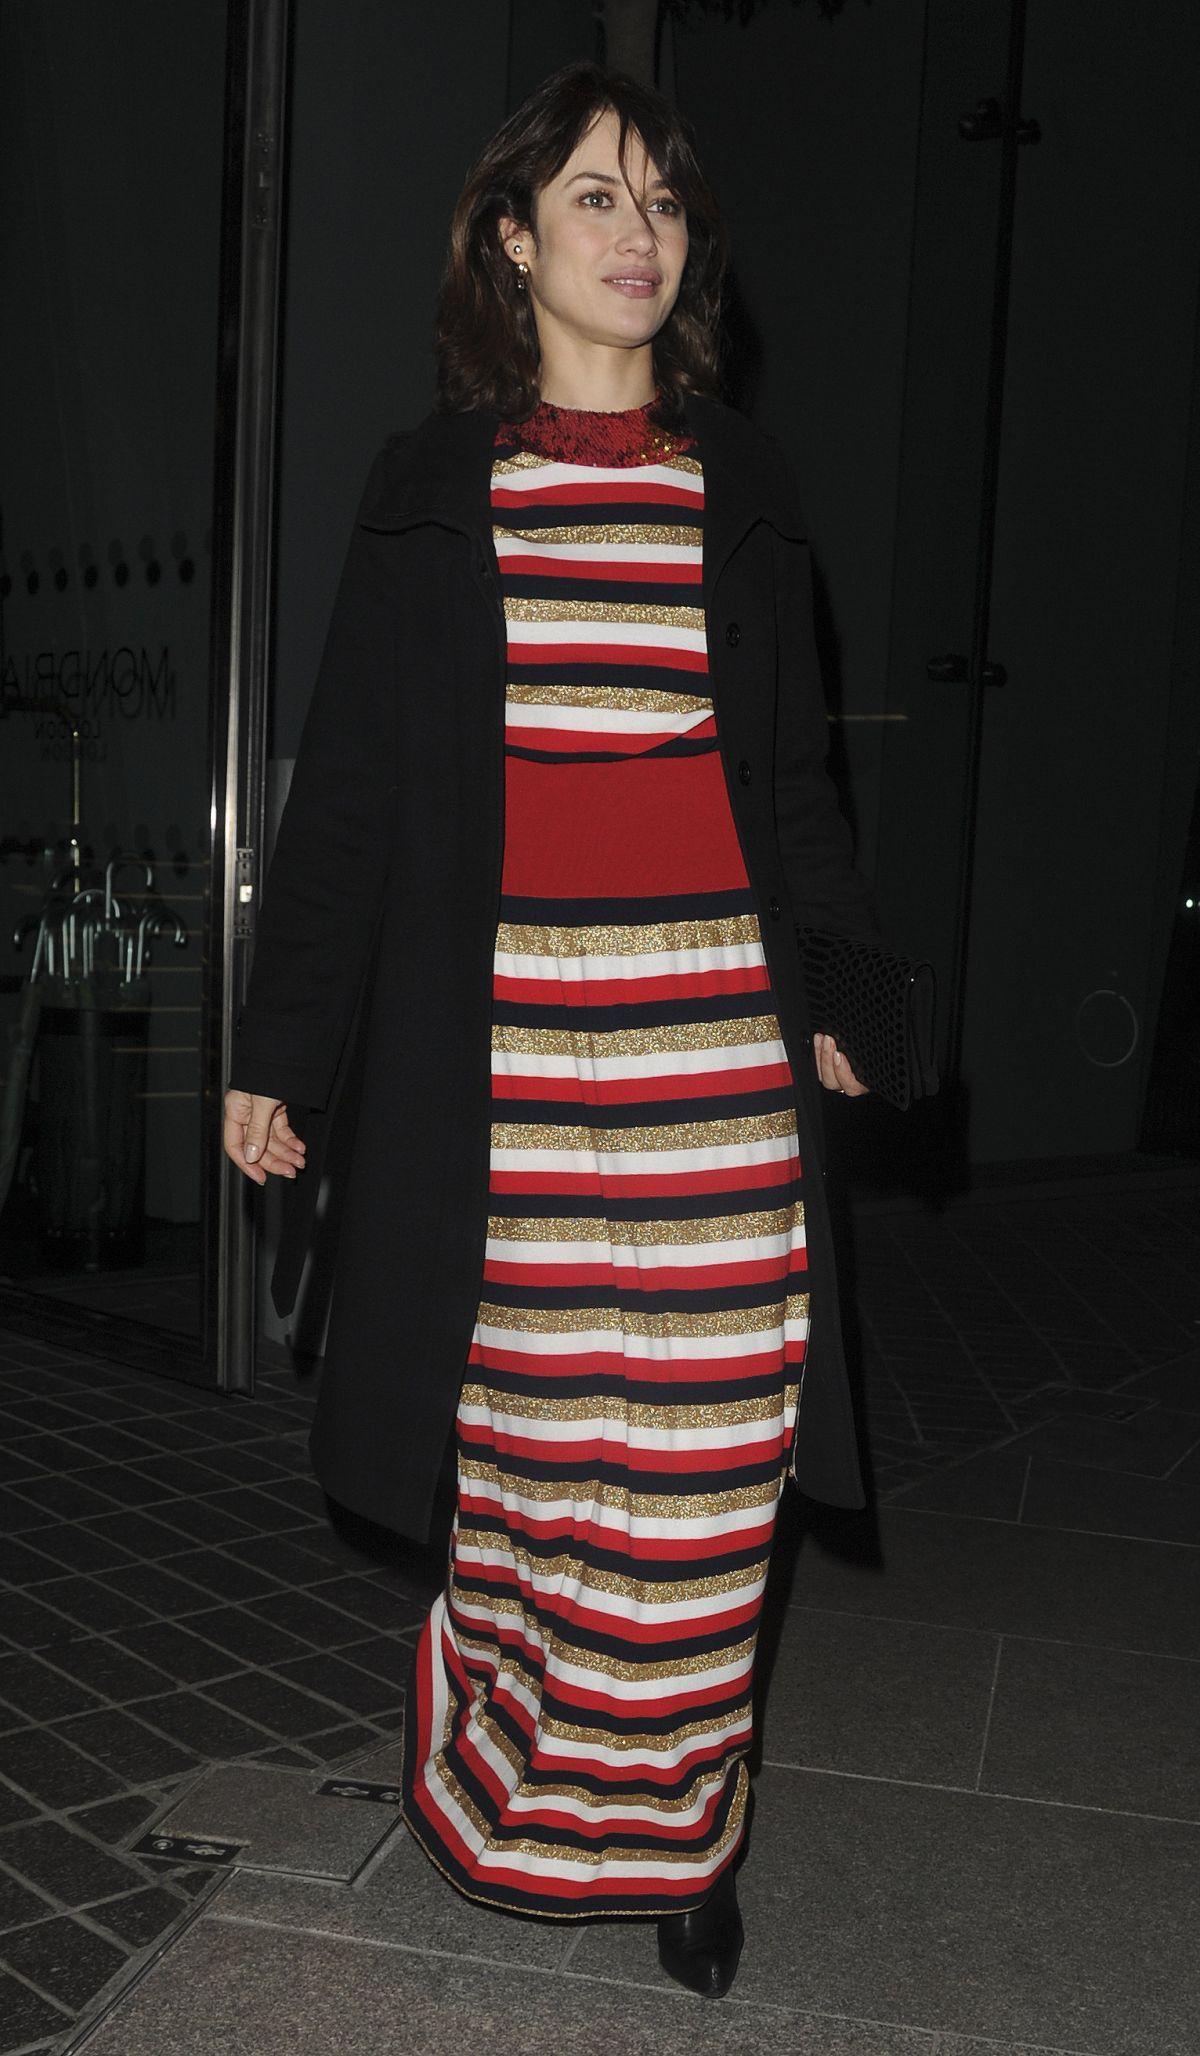 OLGA KURYLENKO at The Fall Magazine Launch Party in London 01/18/2017